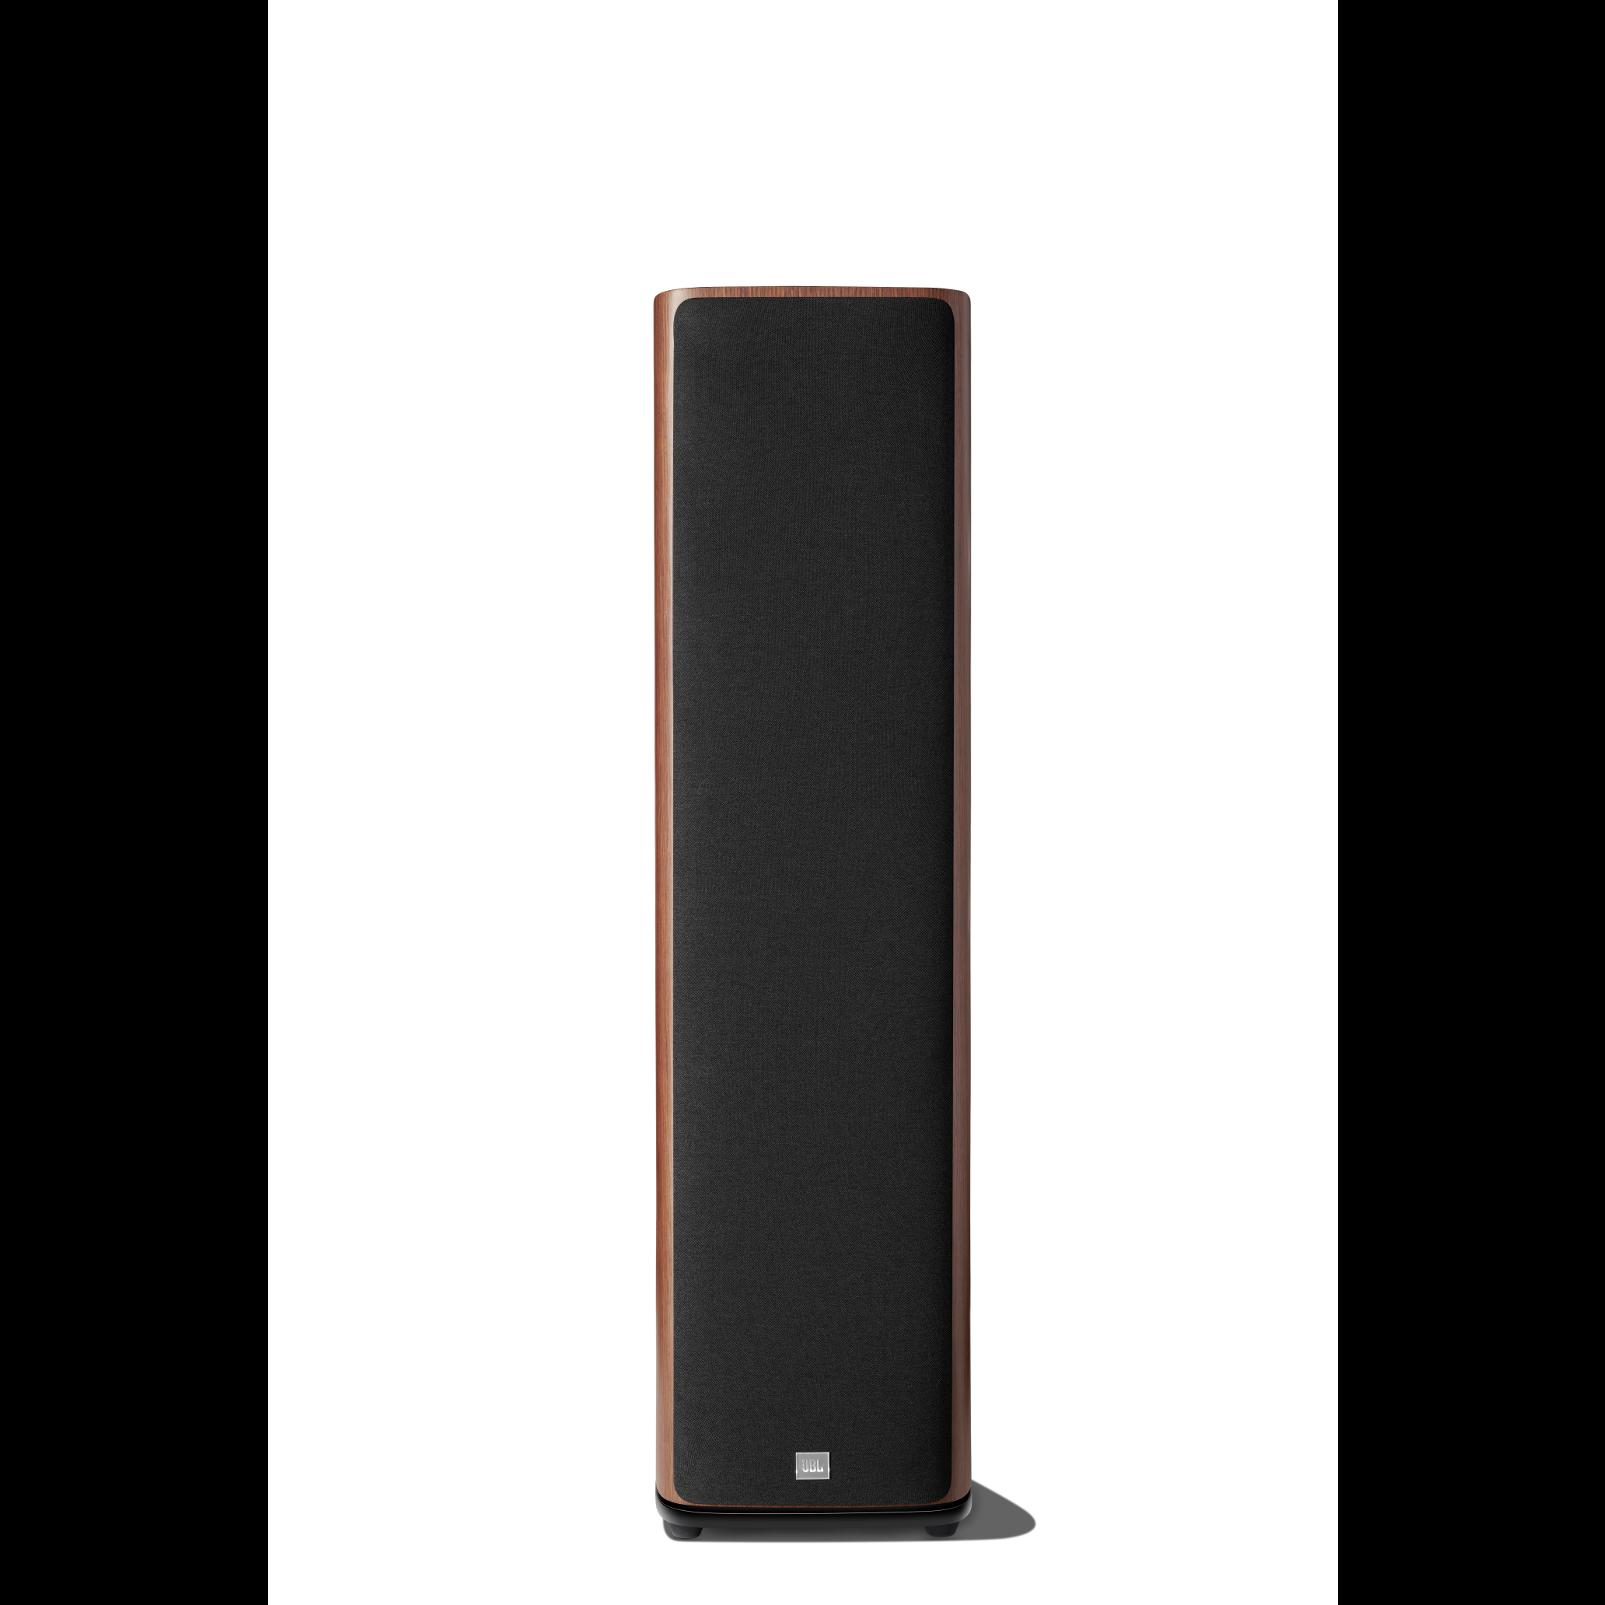 HDI-3800 - Walnut - 2 ½-way Triple 8-inch (200mm) Floorstanding Loudspeaker - Front